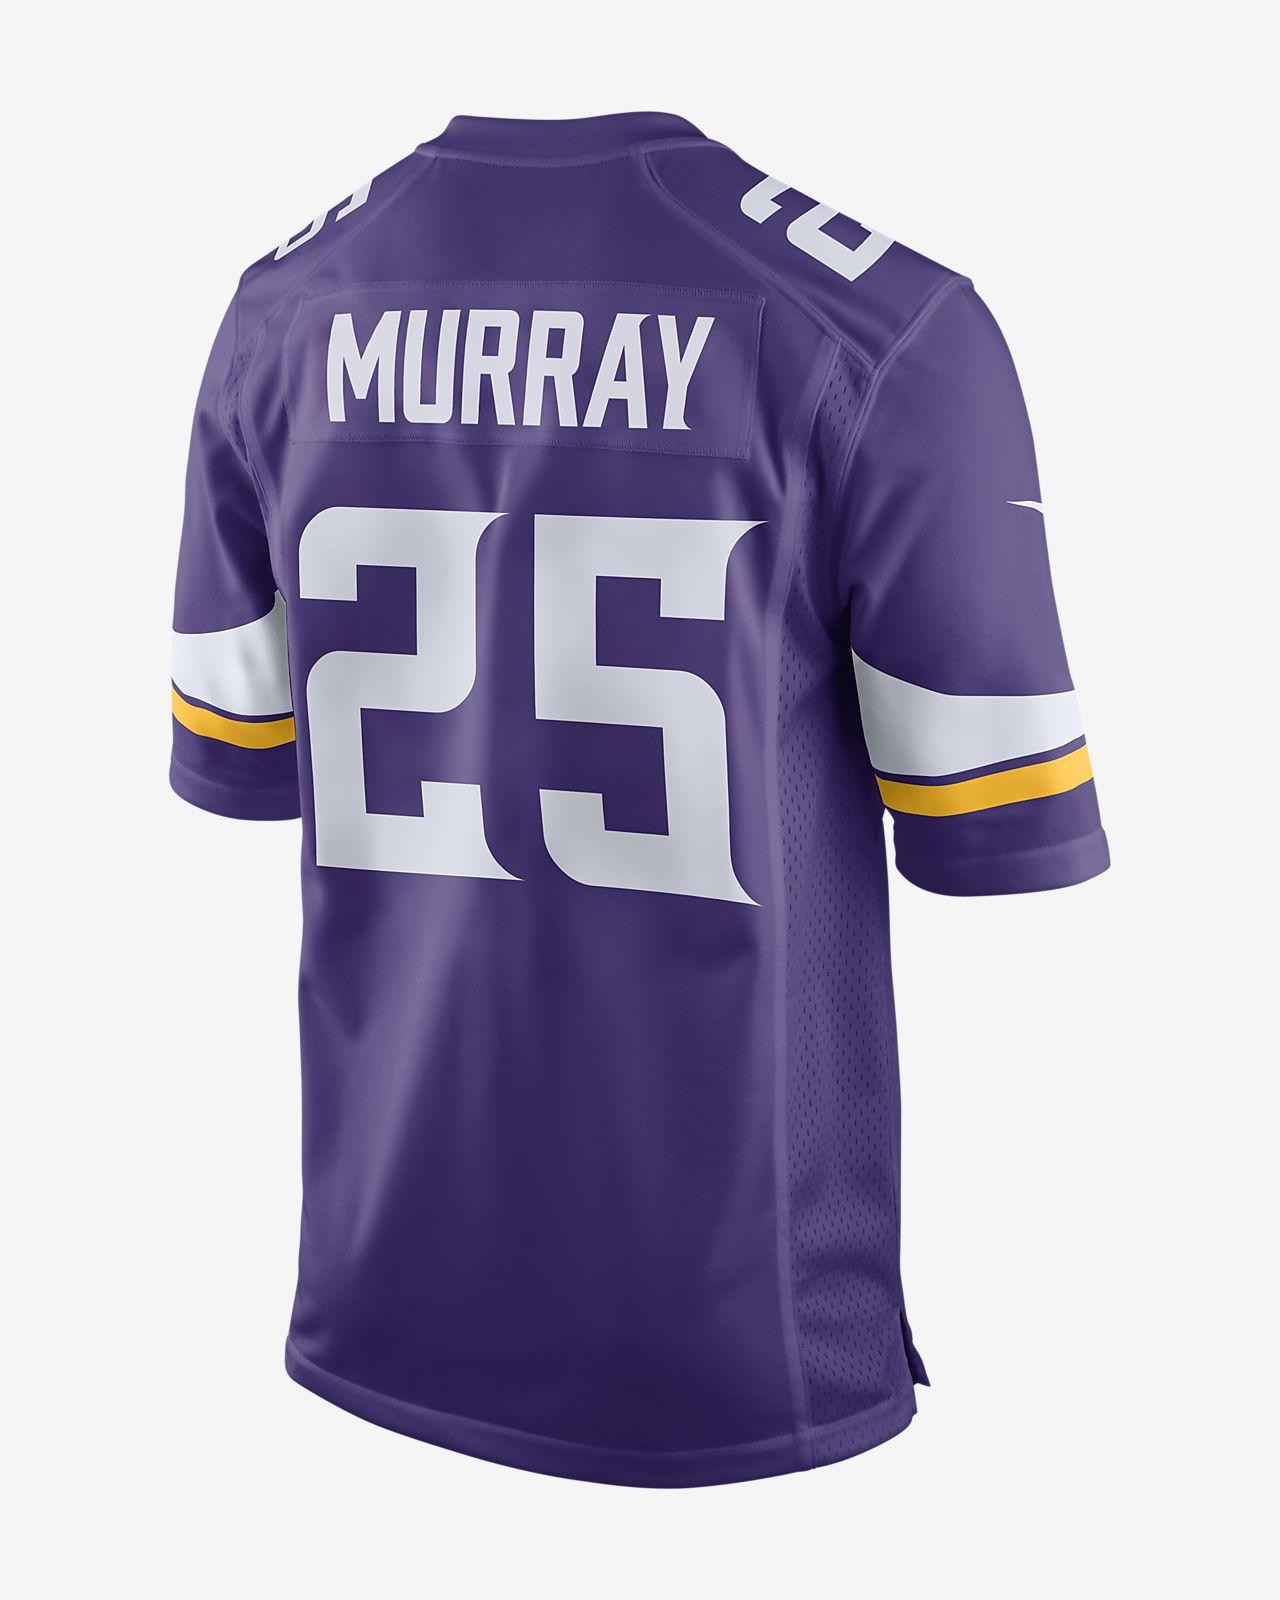 6b6ab7171 ... NFL Minnesota Vikings (Latavius Murray) Camiseta de fútbol americano de  la 1.ª